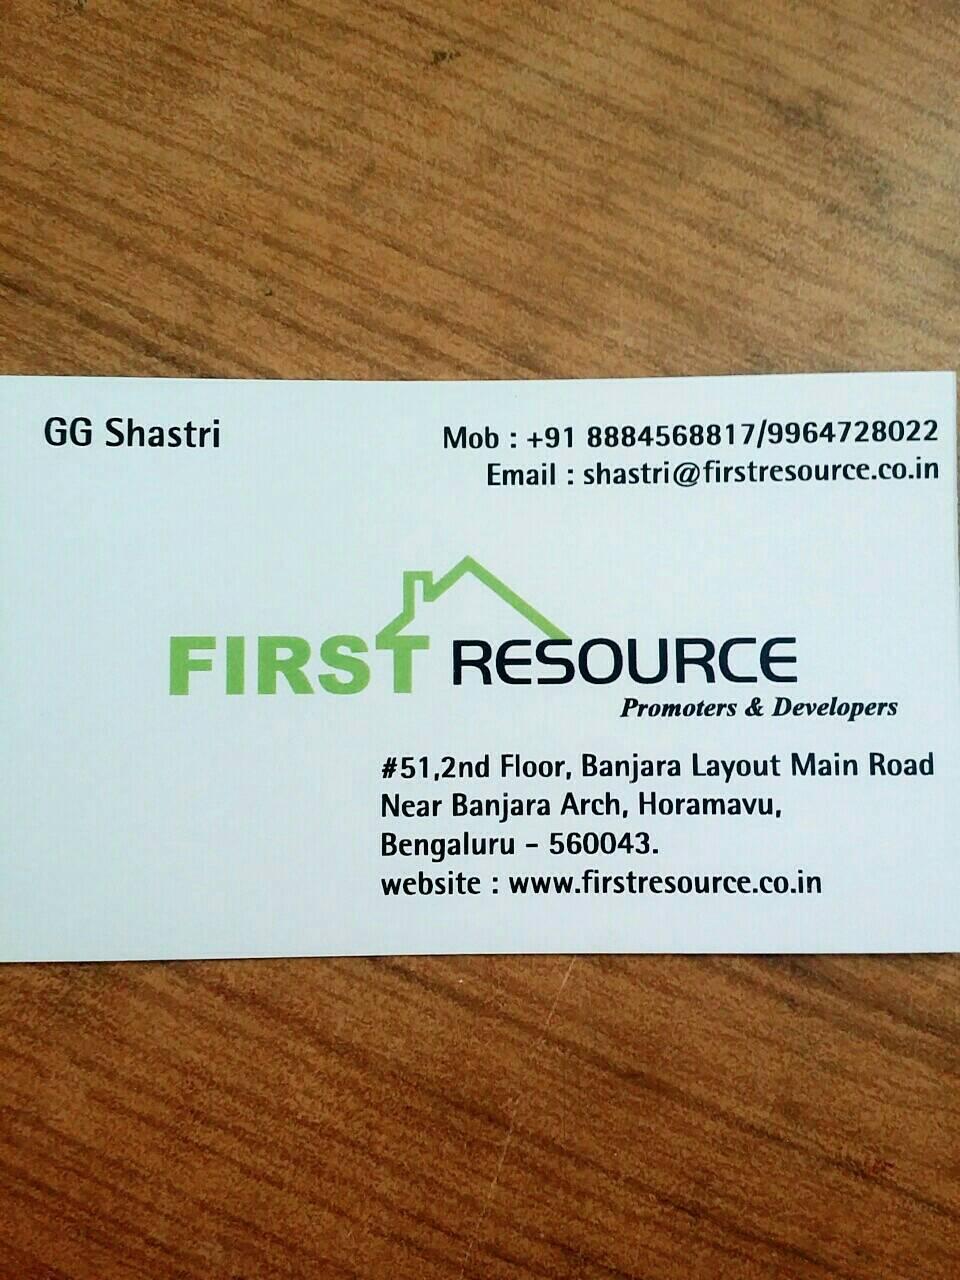 First Resource